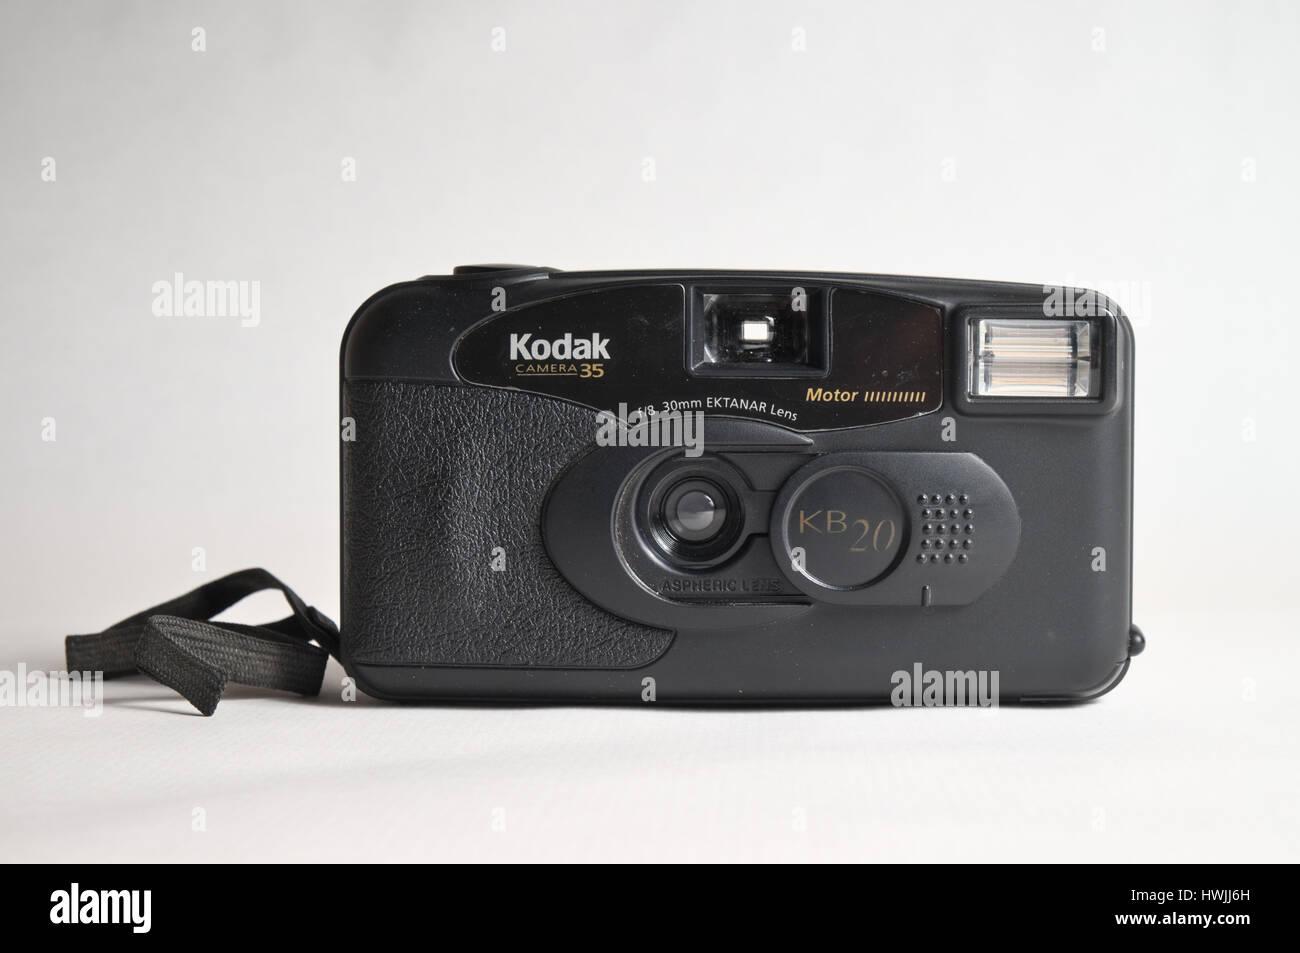 Antigua Camara Analogica De Kodak Modelo Kb20 Camara Compacta De